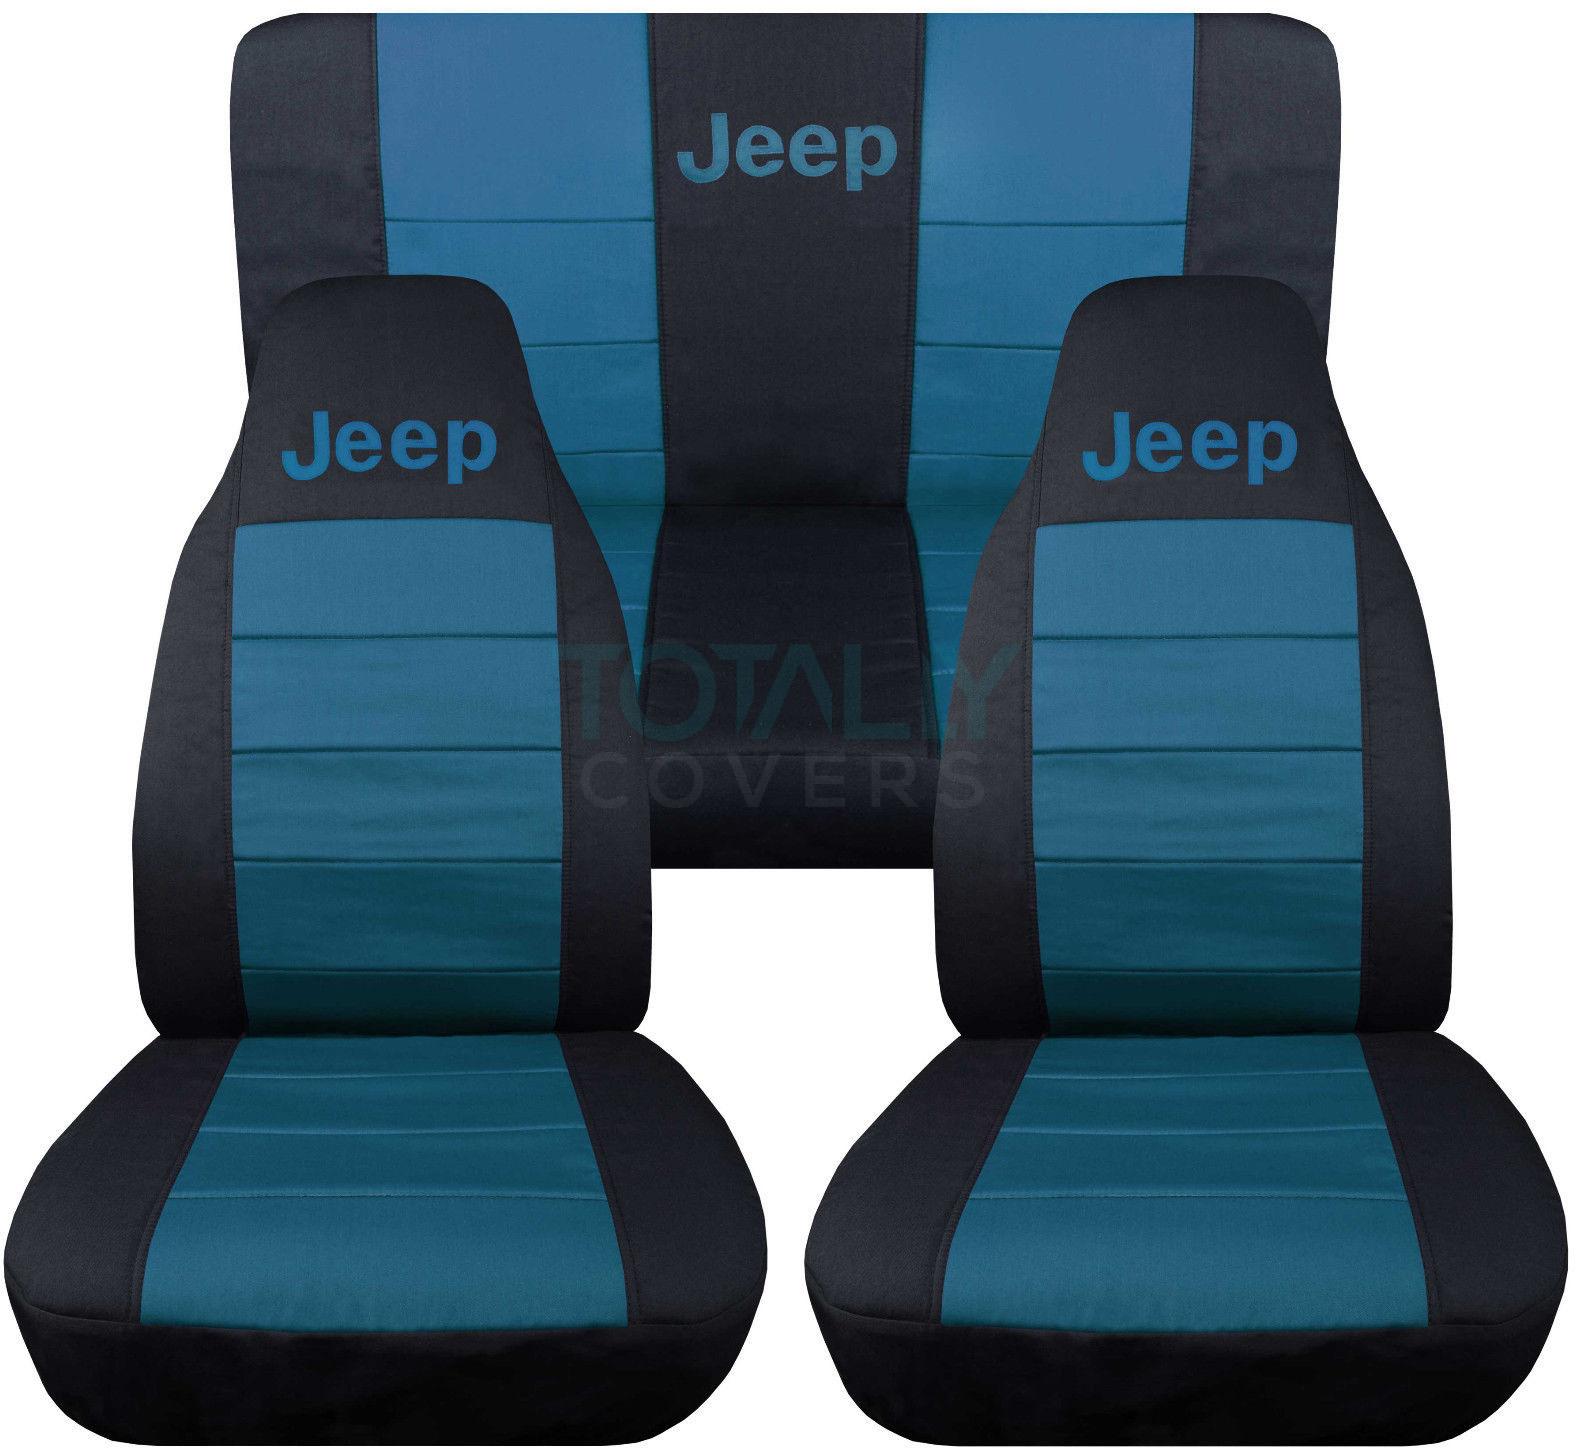 jeep wrangler yj/tj/jk 1987-2017 2-tone seat covers w logo front